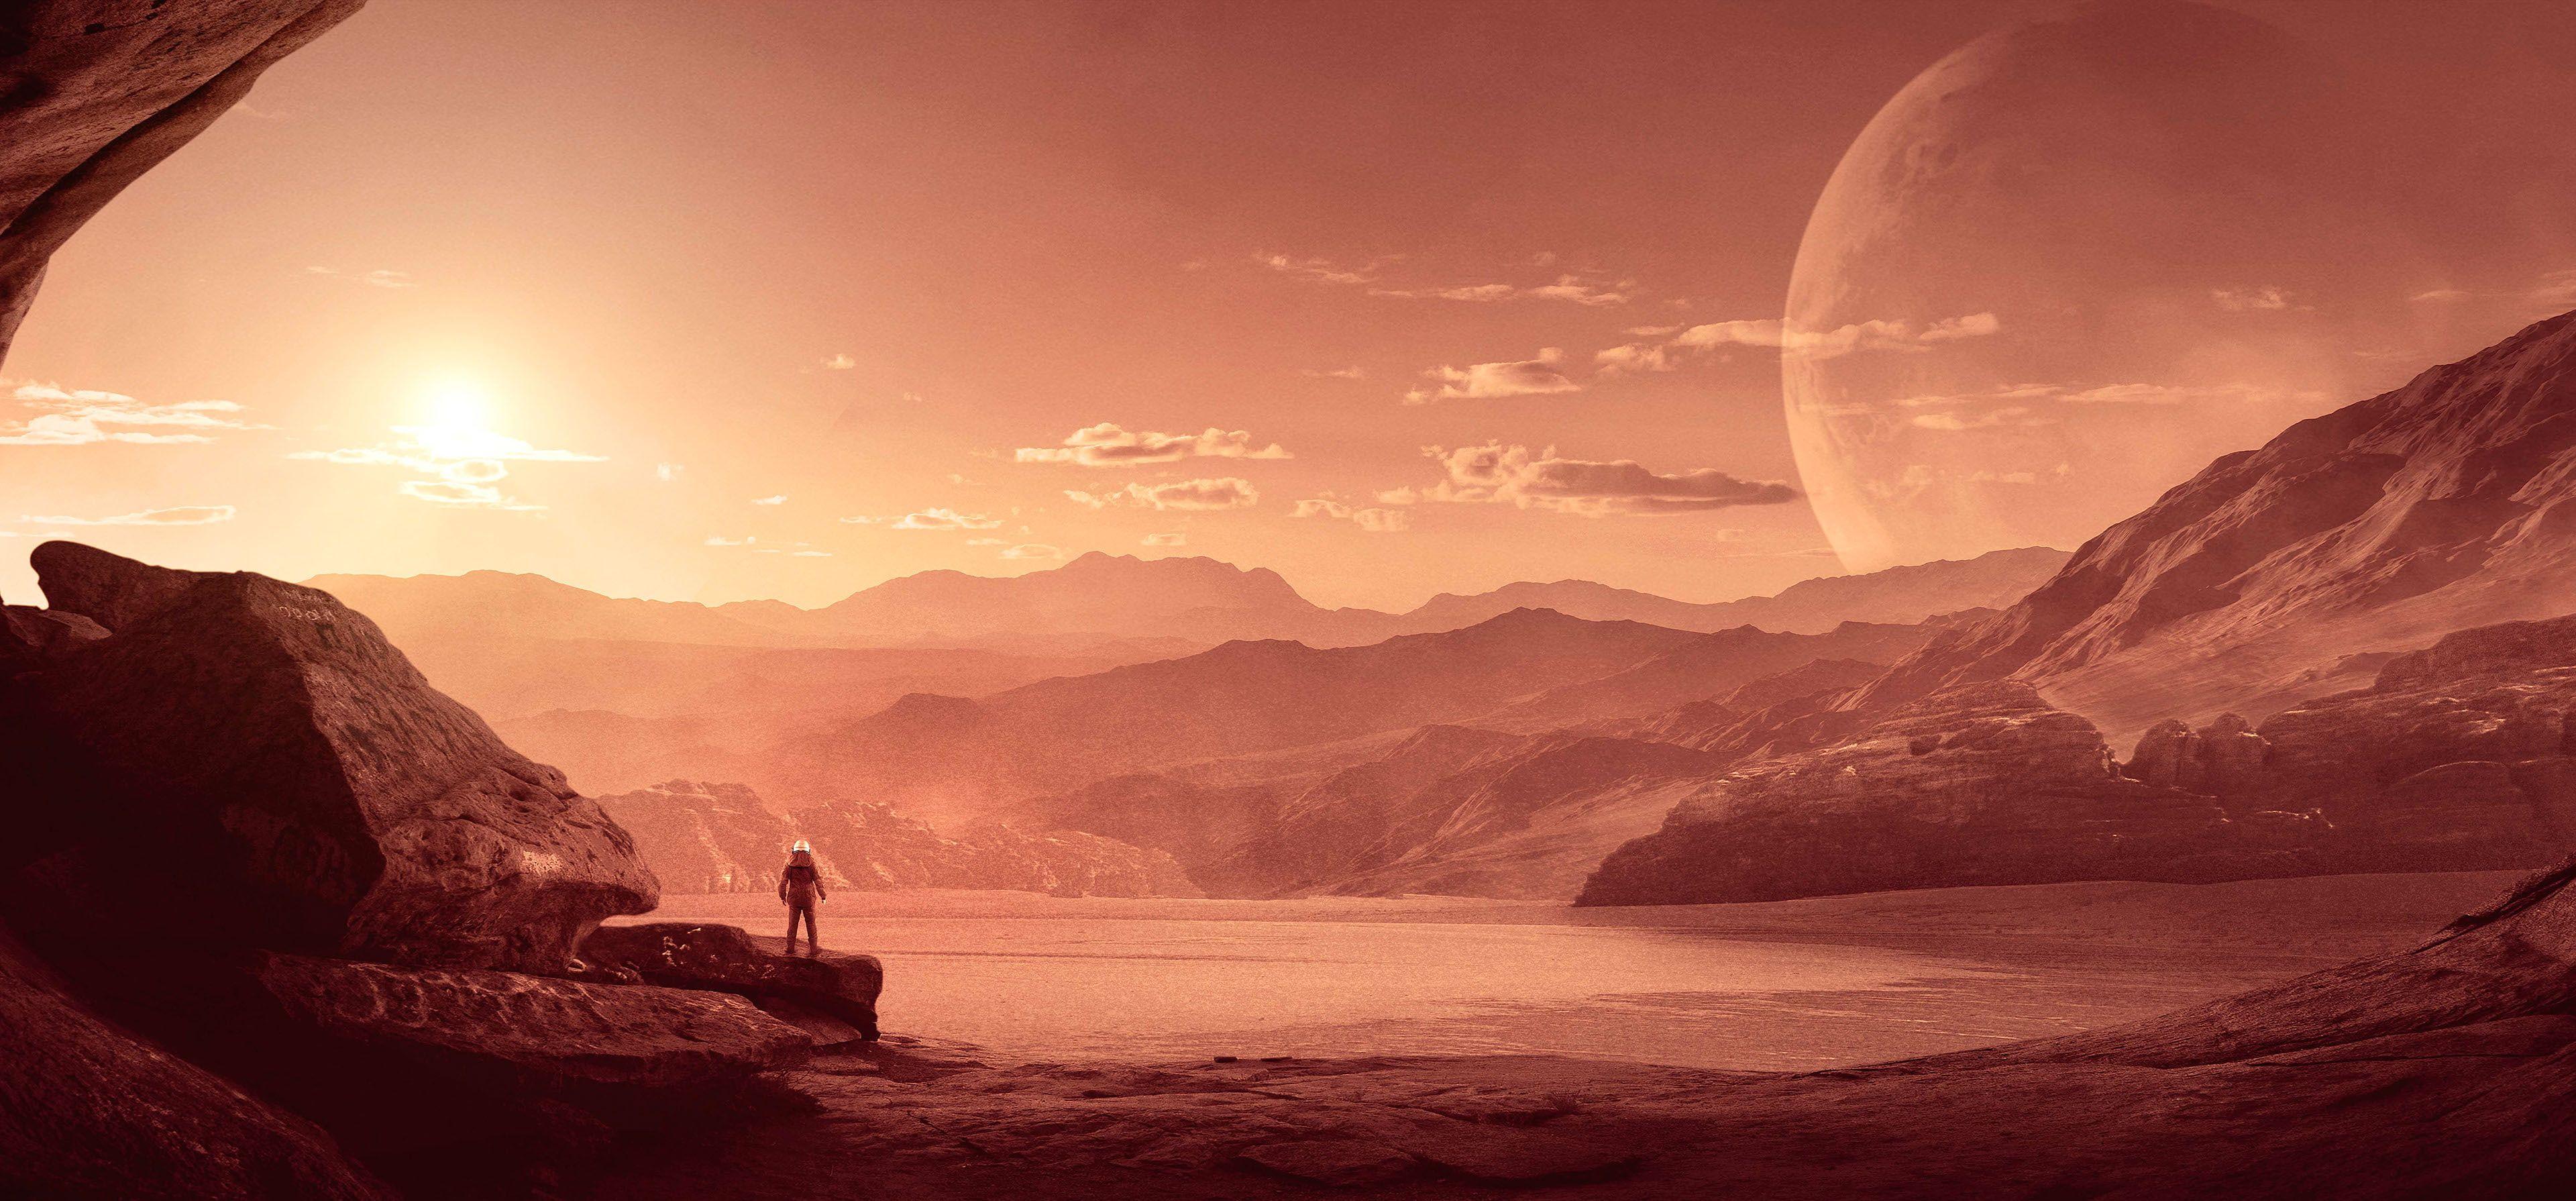 Mars 4k Astronaut Alone Sci Fi 4k Wallpaper Hdwallpaper Desktop In 2020 Hd Wallpaper Futuristic City Nature